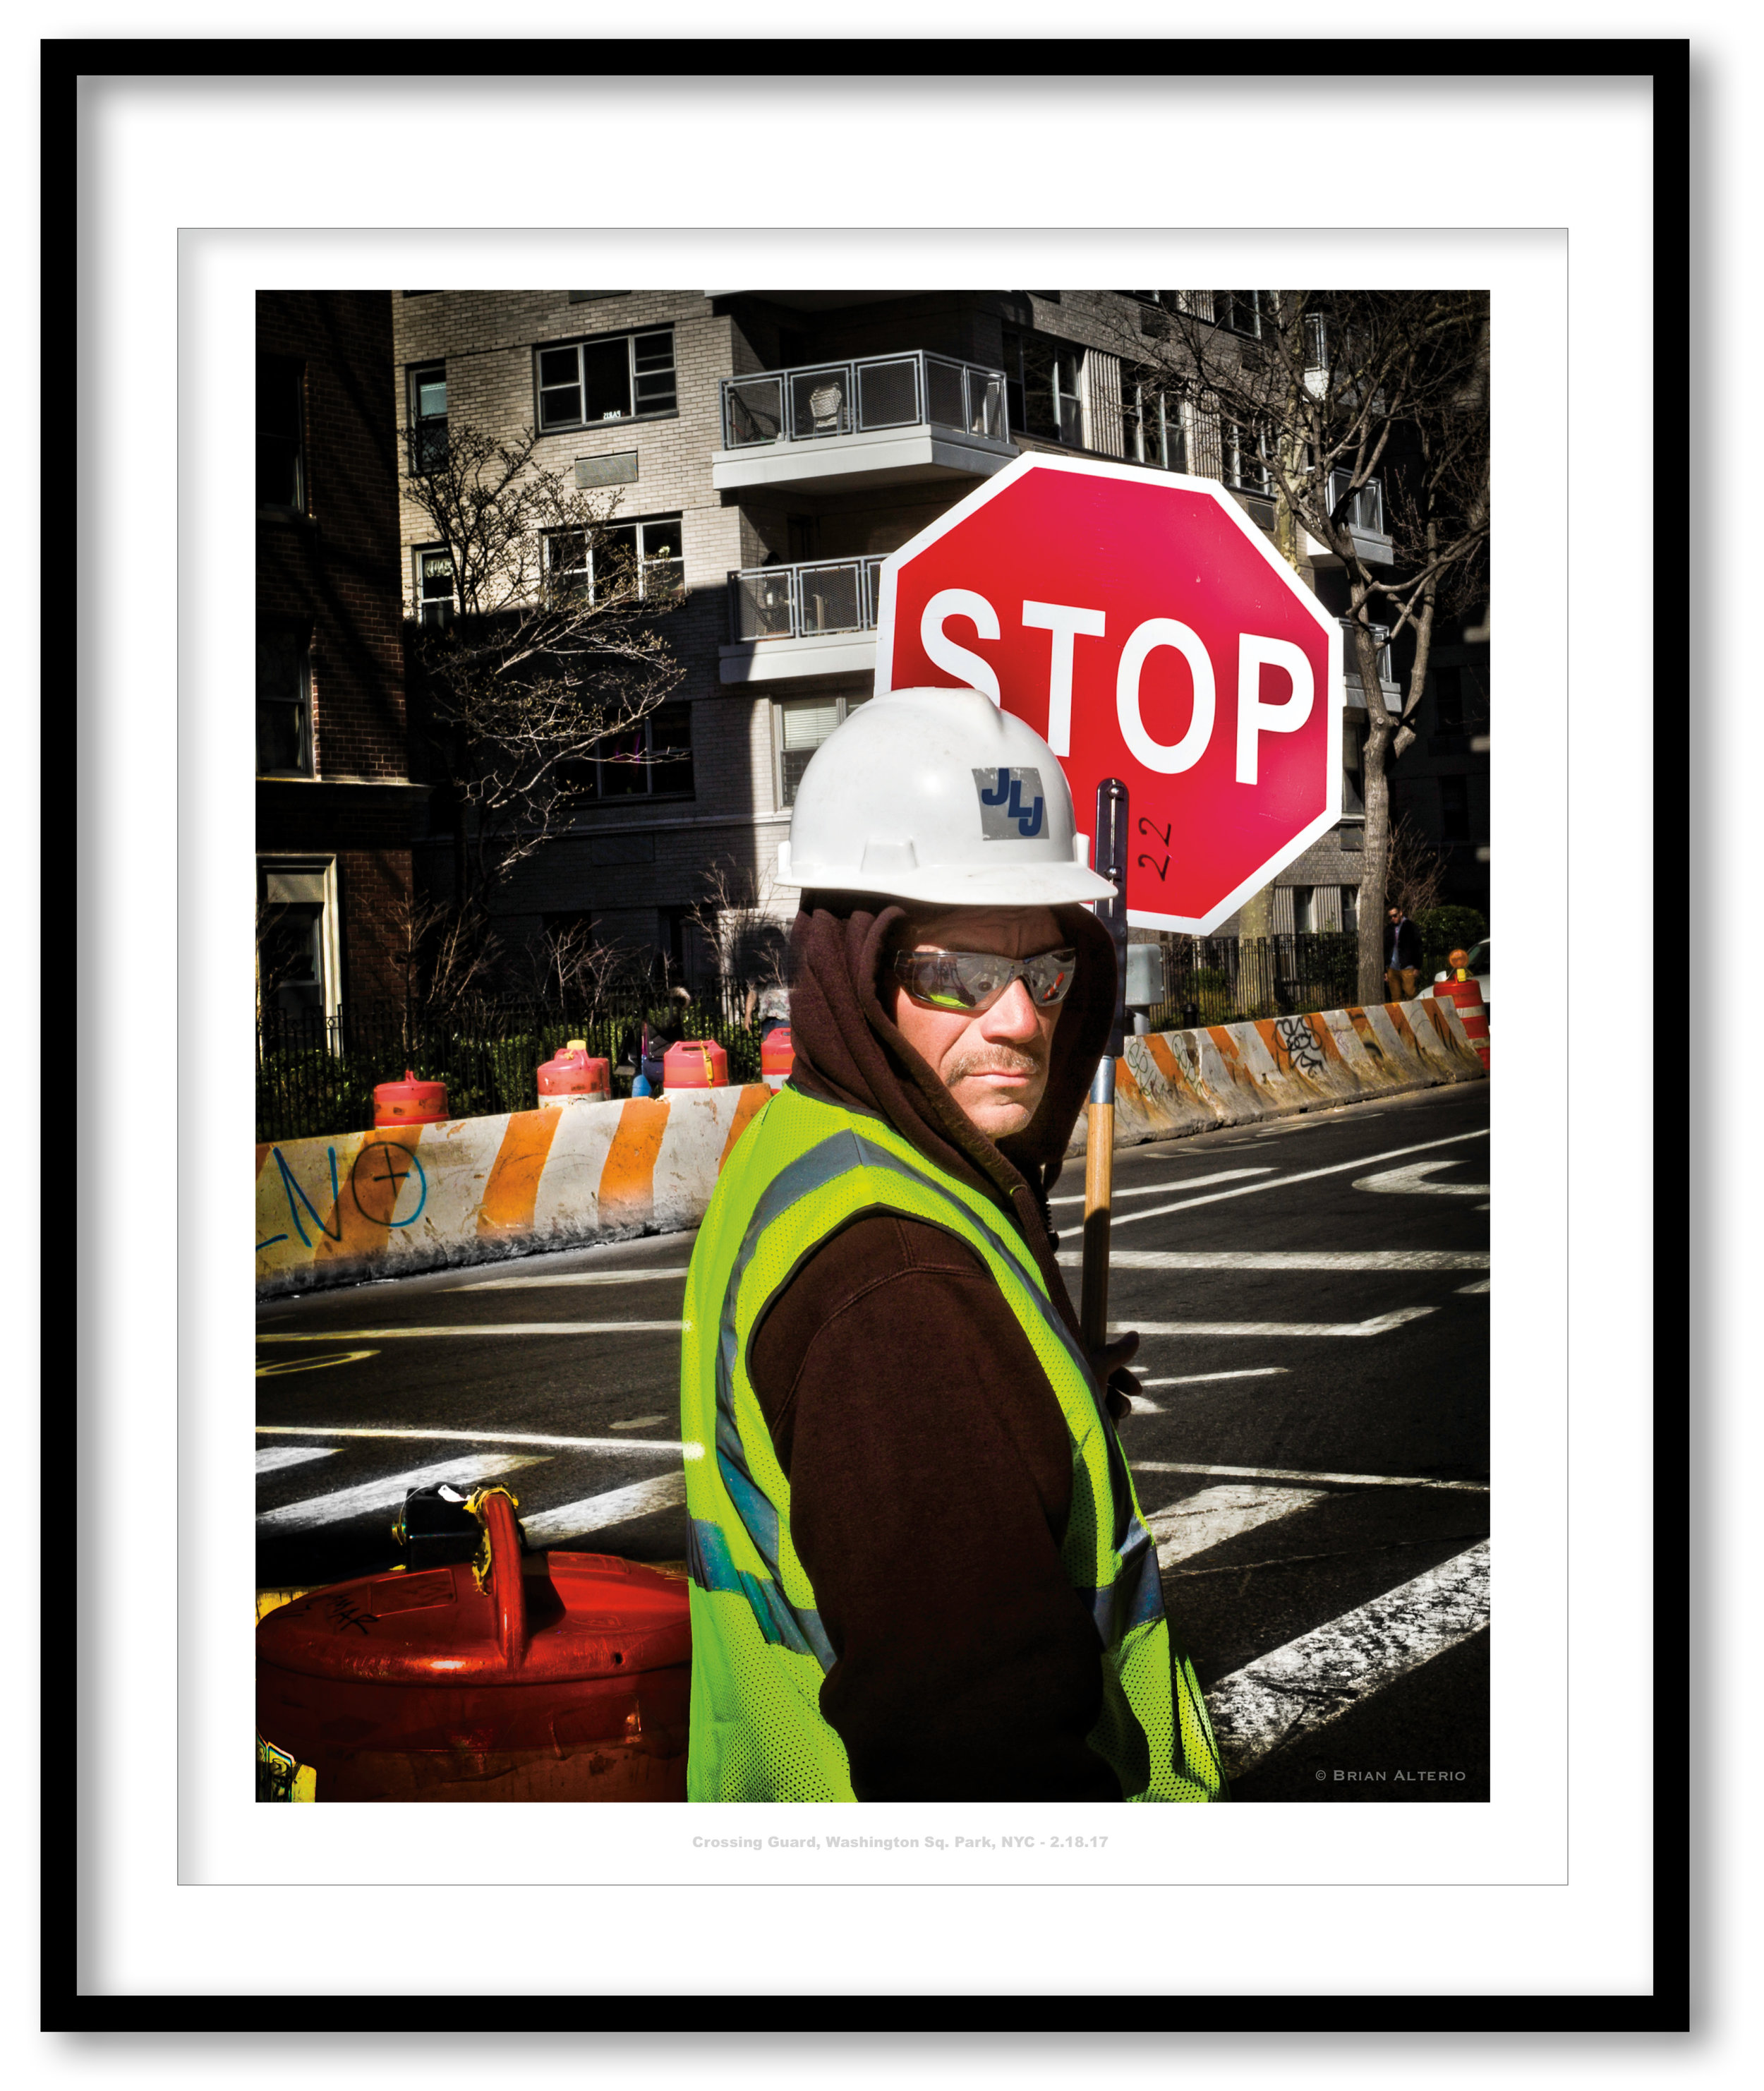 Crossing Guard, Washington Sq. Park, NYC - 2.18.17 - Framed.jpg